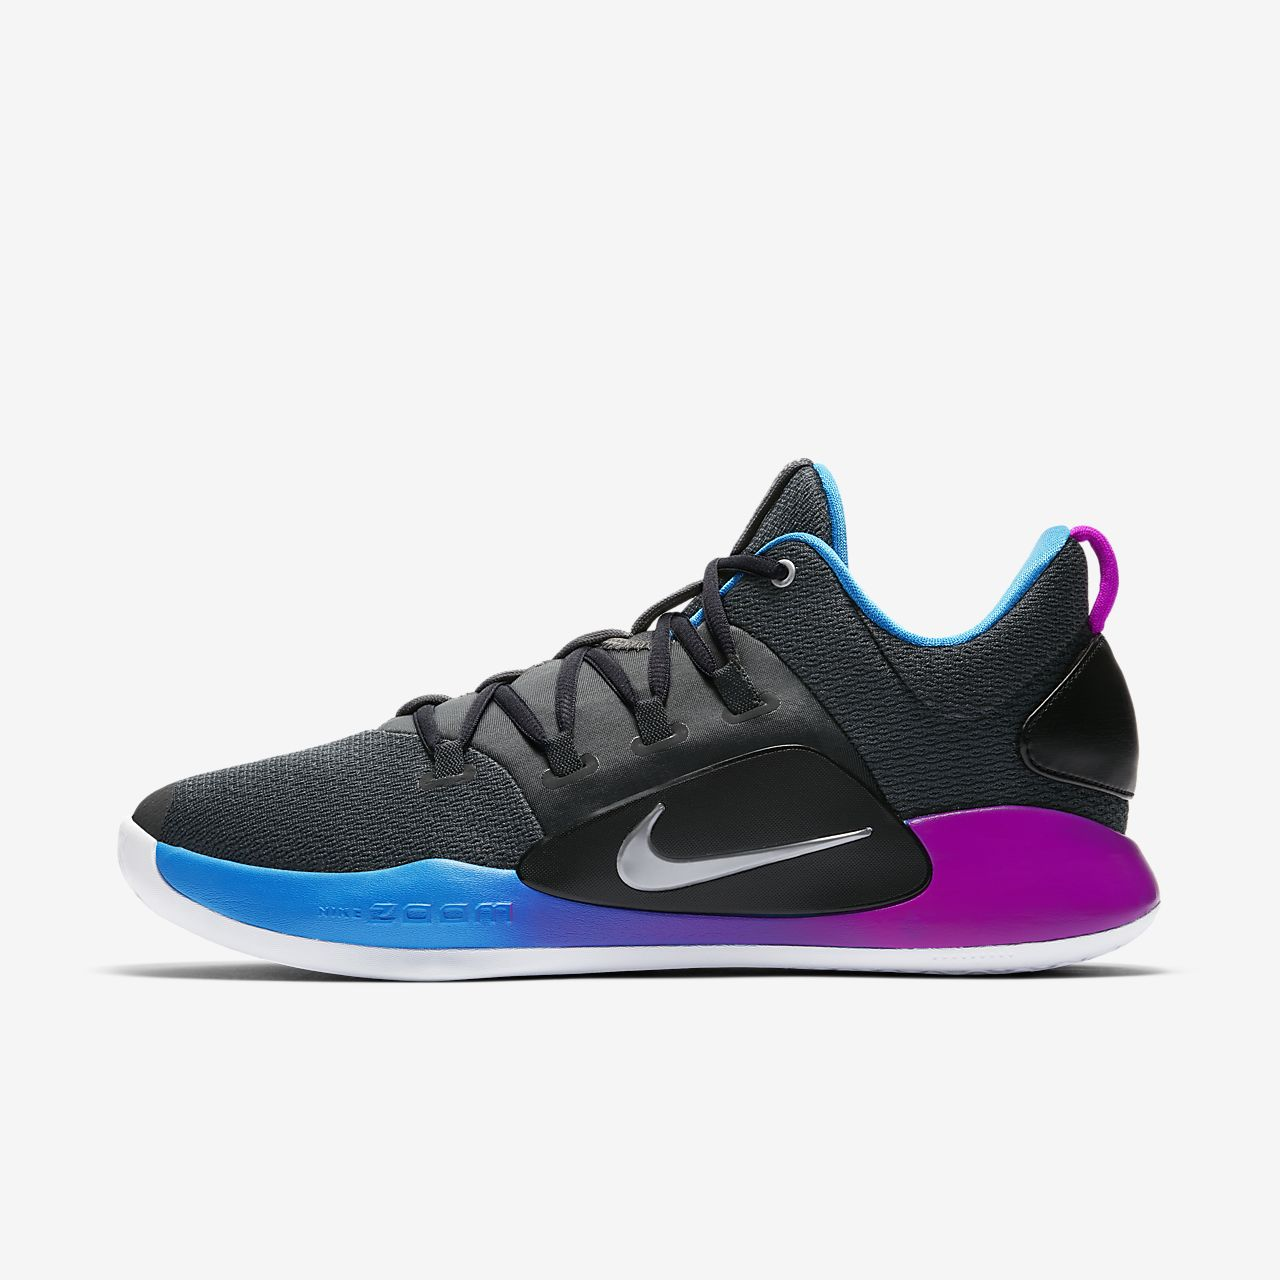 f4f68daa42a0 ... where can i buy nike hyperdunk x low basketball shoe 7e797 8ddb6